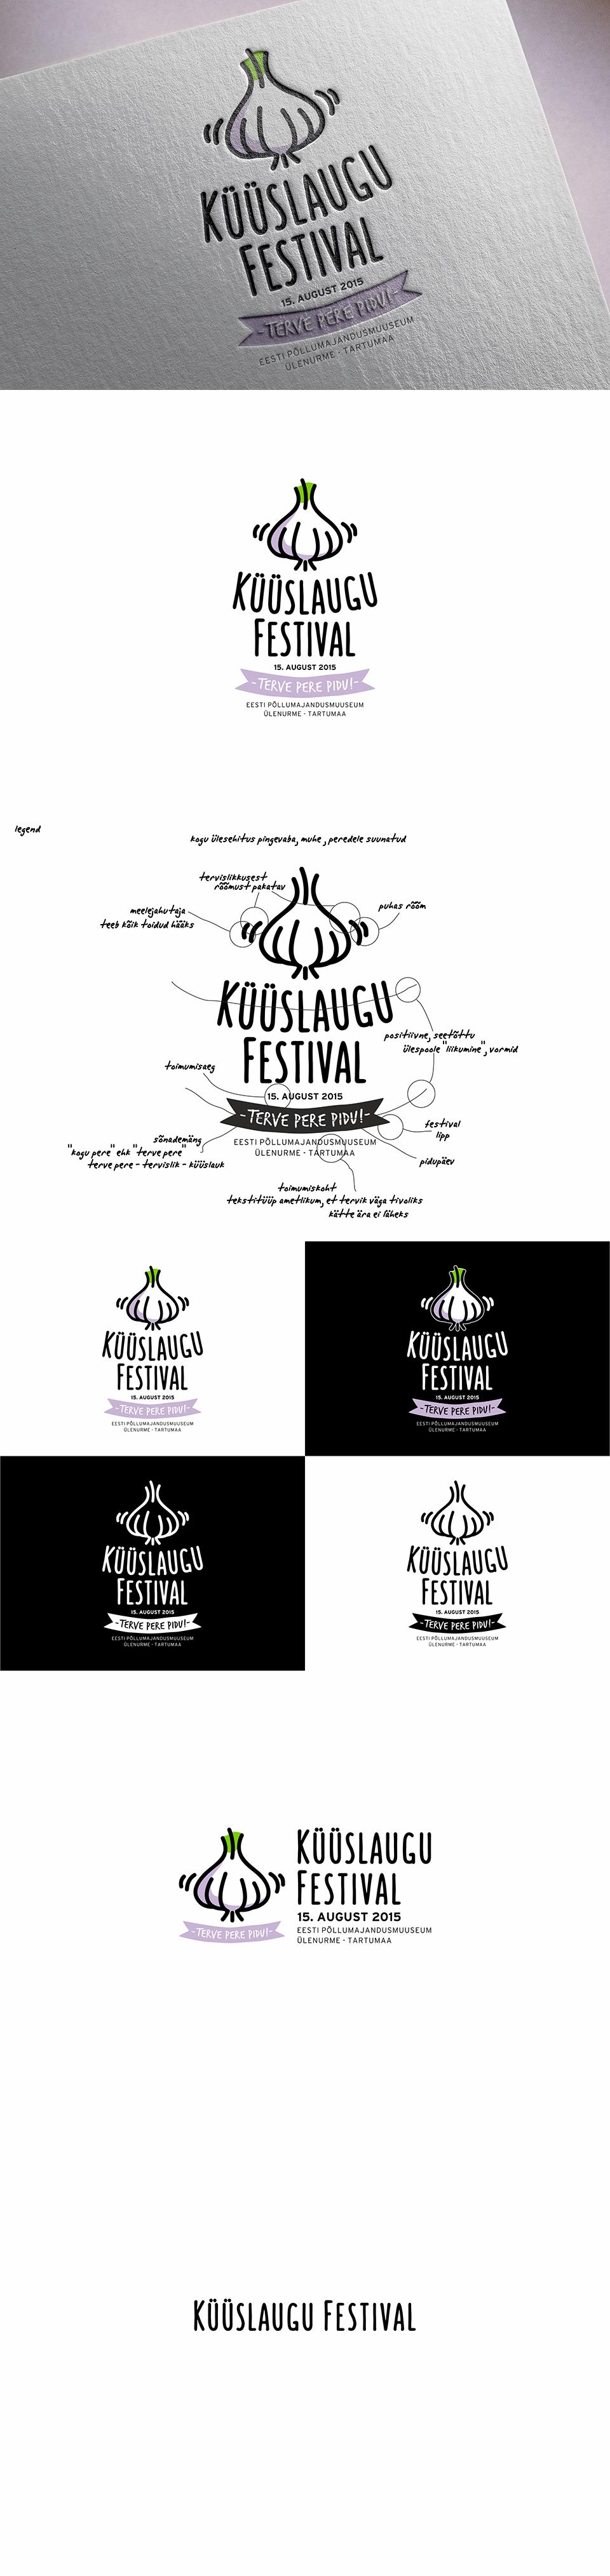 creativecorner-kyyslaugufestival-1